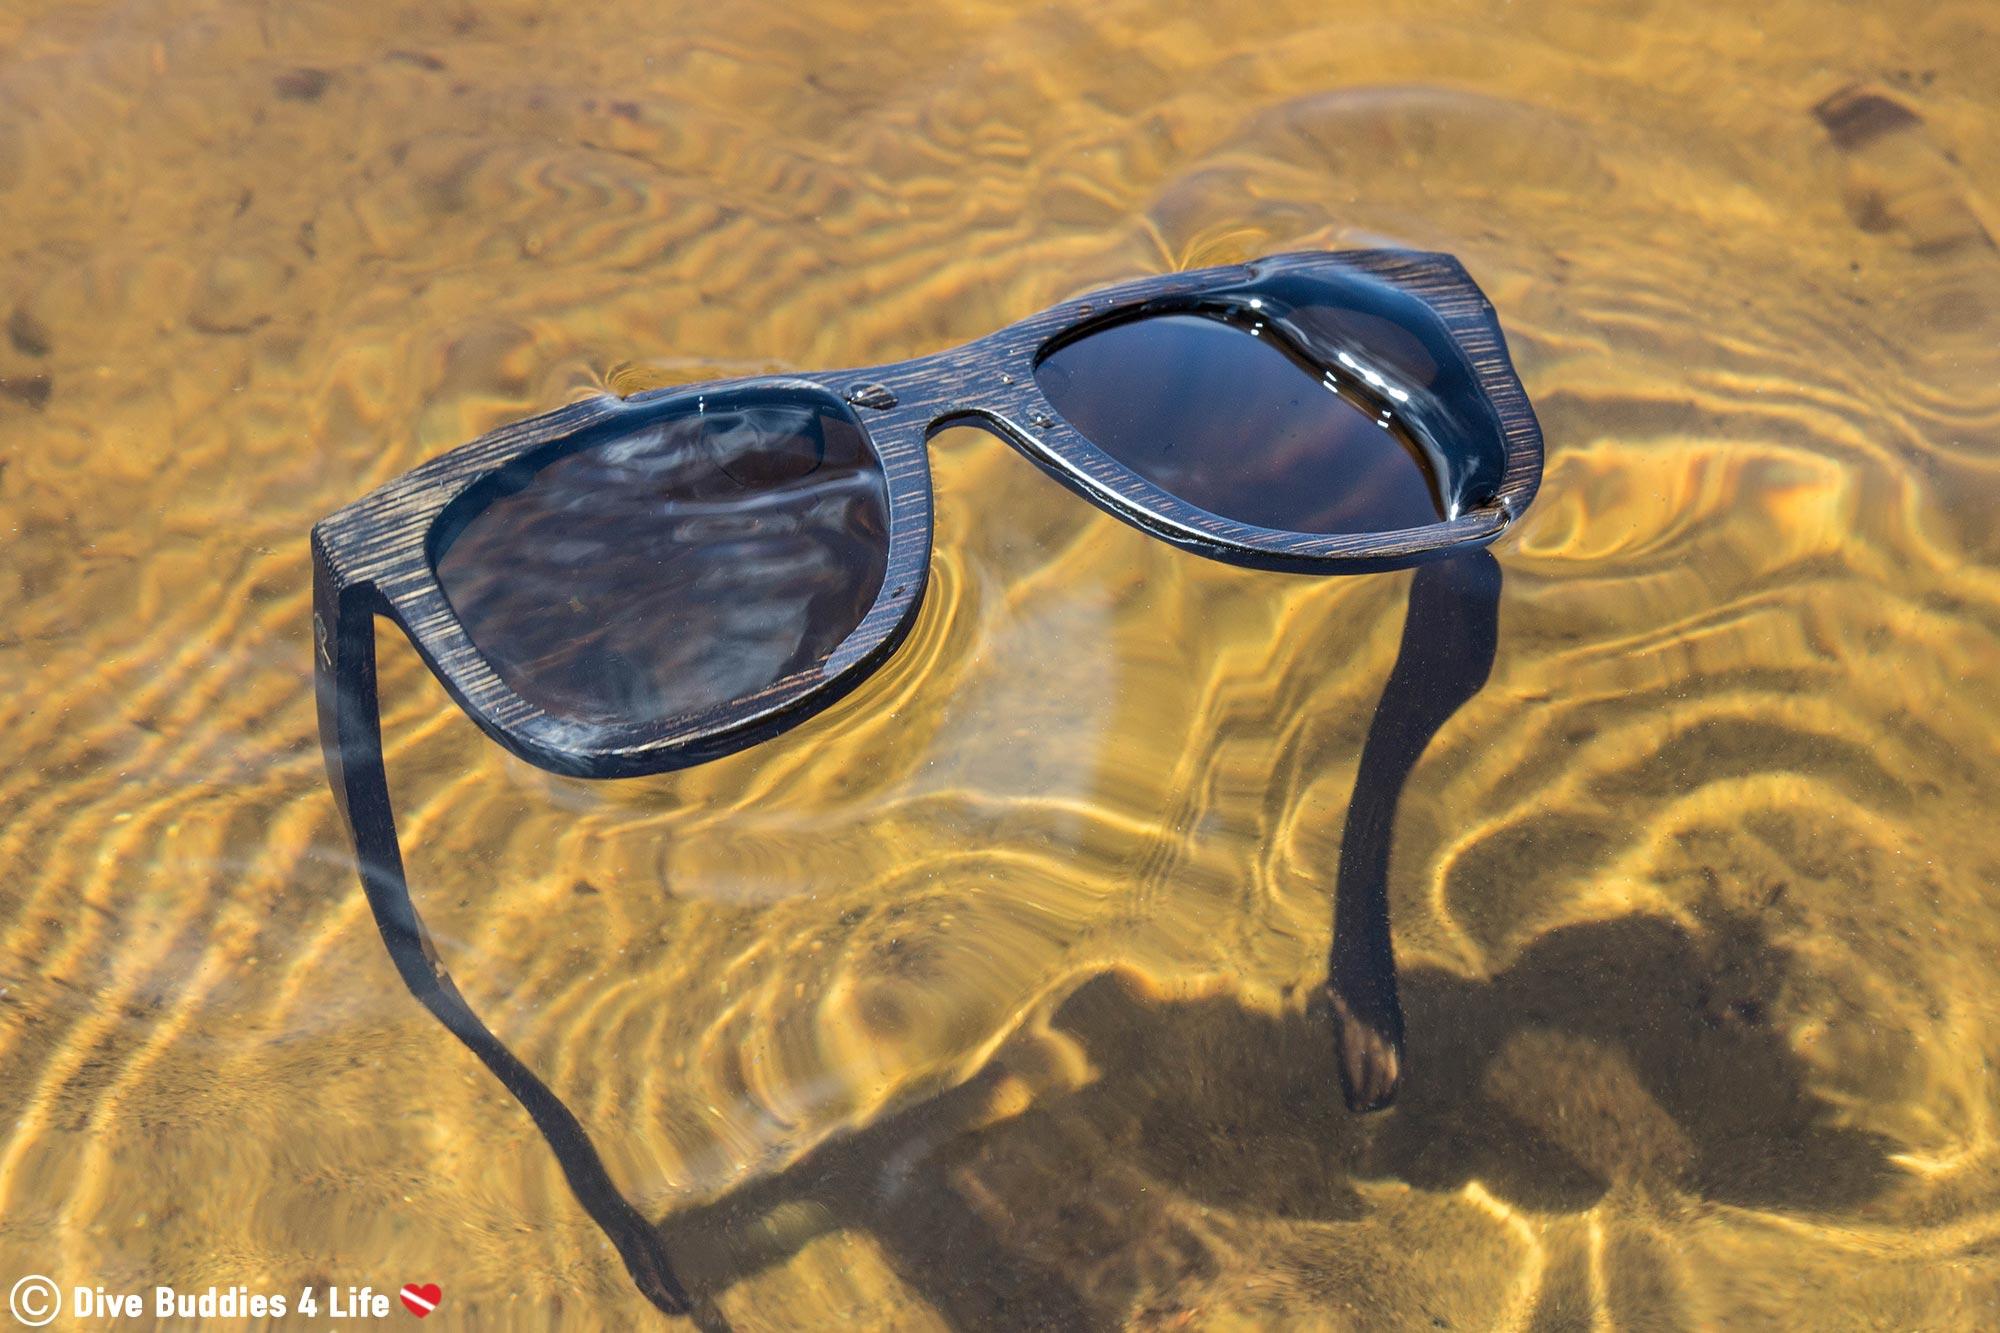 The Wildwood Original Floating Sunglasses In A Lake